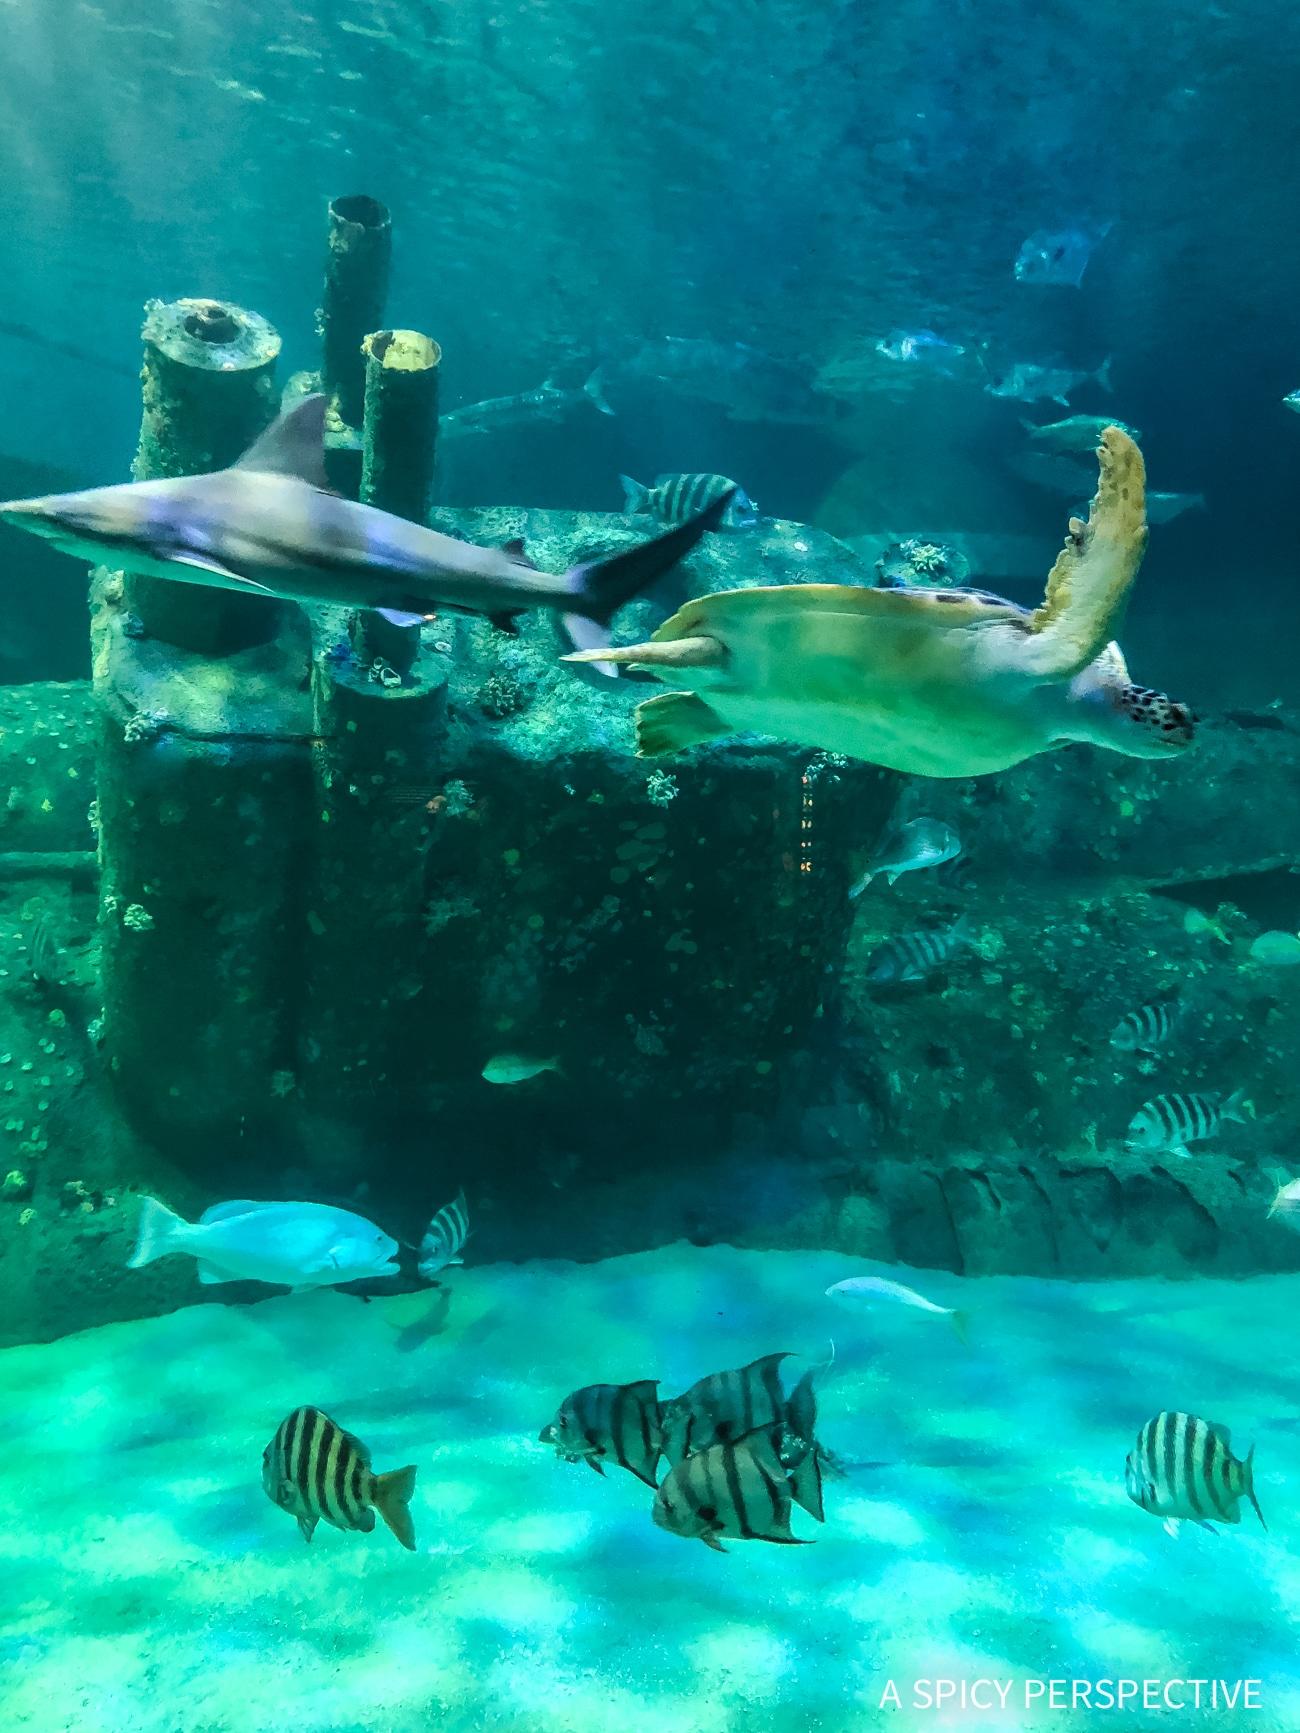 NC Aquarium - Why You Should Visit The Crystal Coast Outer Banks NC (Emerald Isle Vacation Travel Tips!)